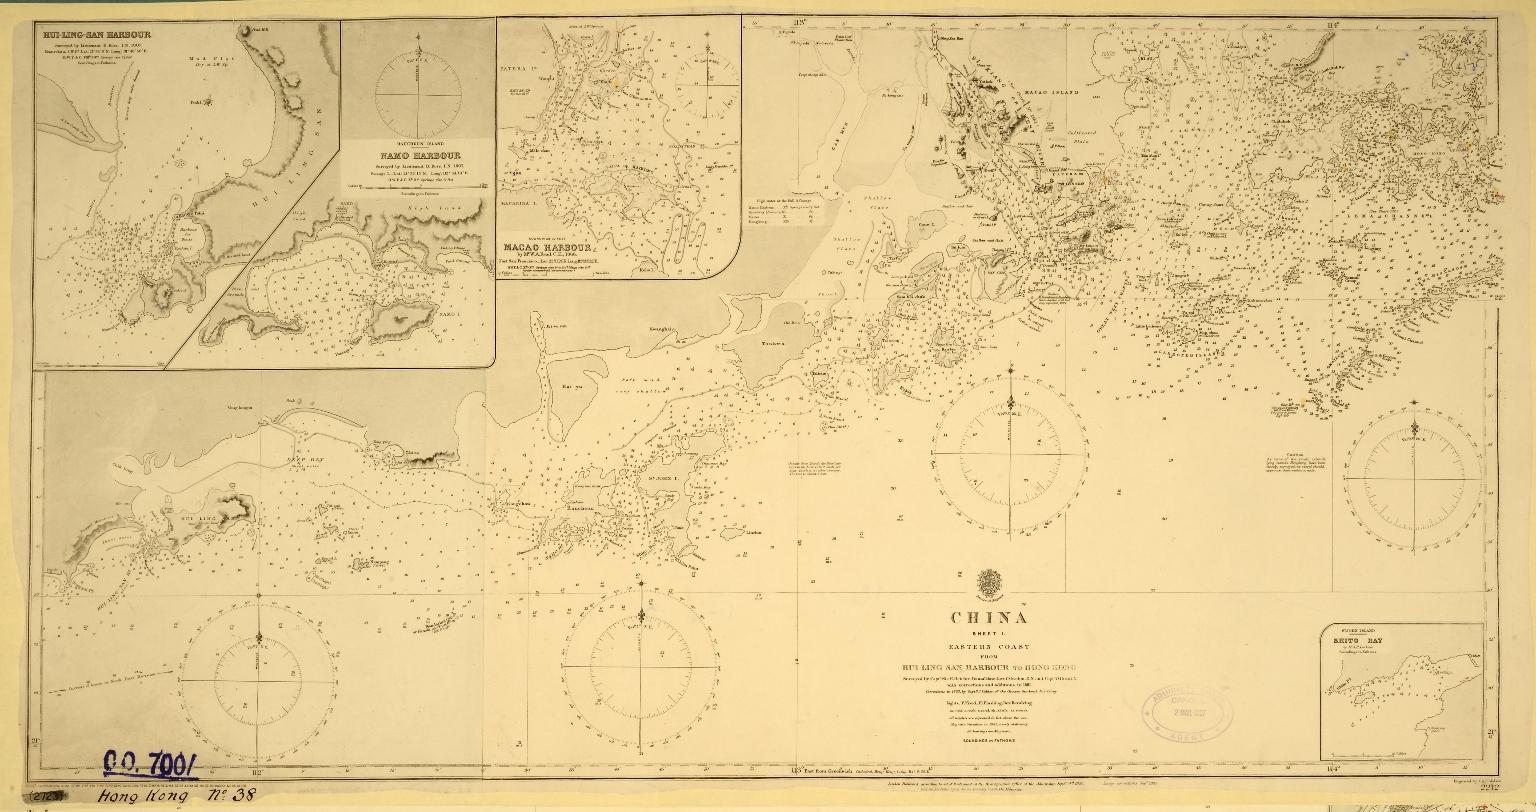 China. Sheet 1. Eastern Coast. From Hui Ling San Harbour to Hong Kong